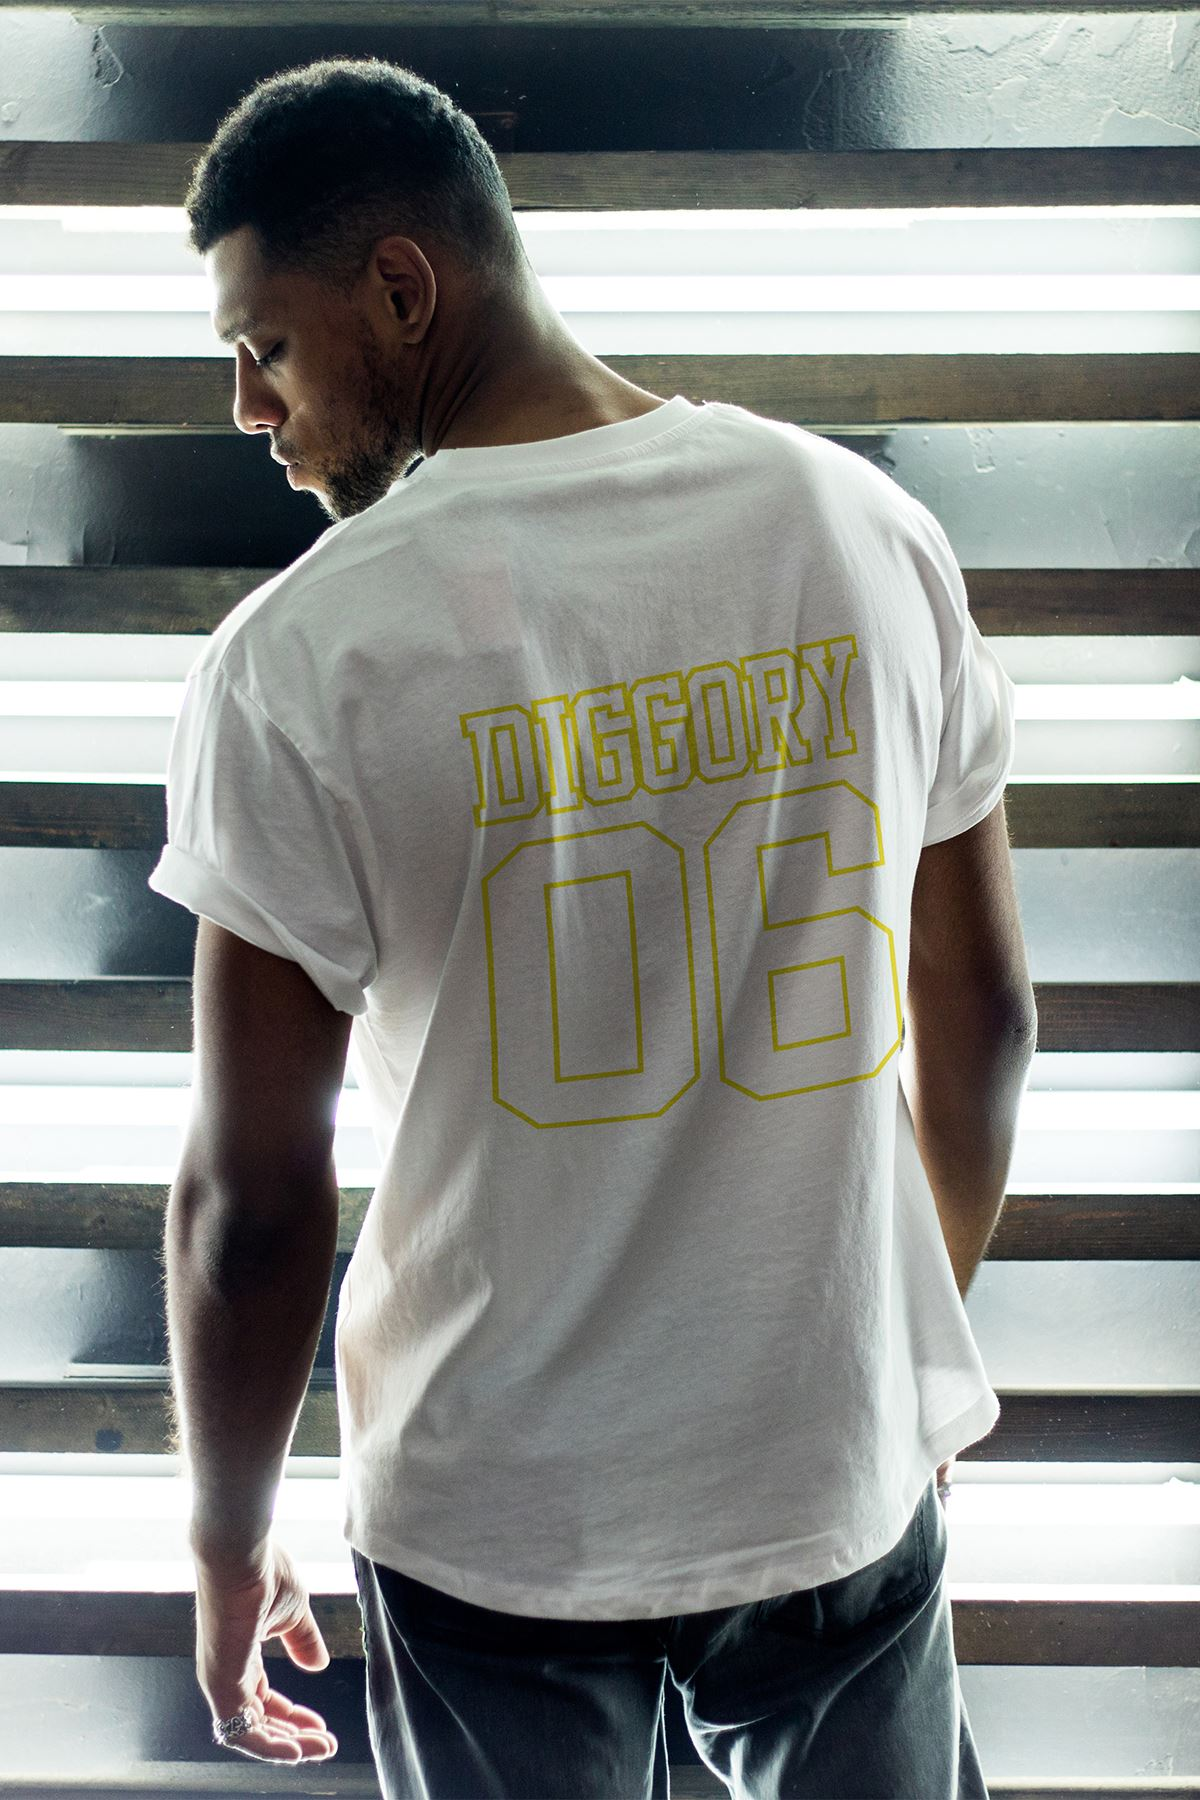 Hufflepuff Beyaz Erkek Oversize Tshirt - Tişört